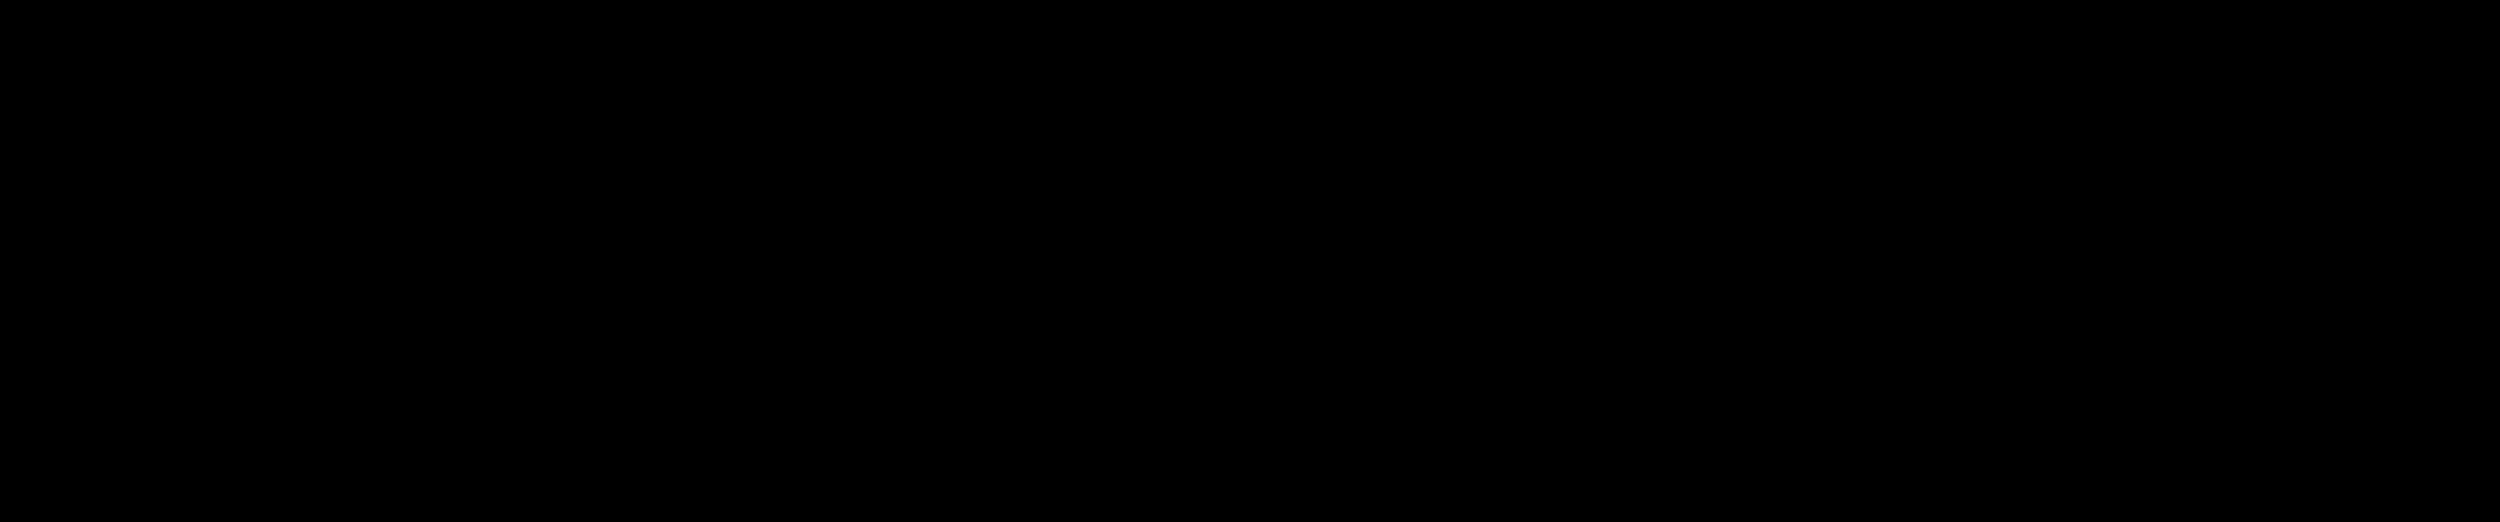 uber-logo-png-6.png